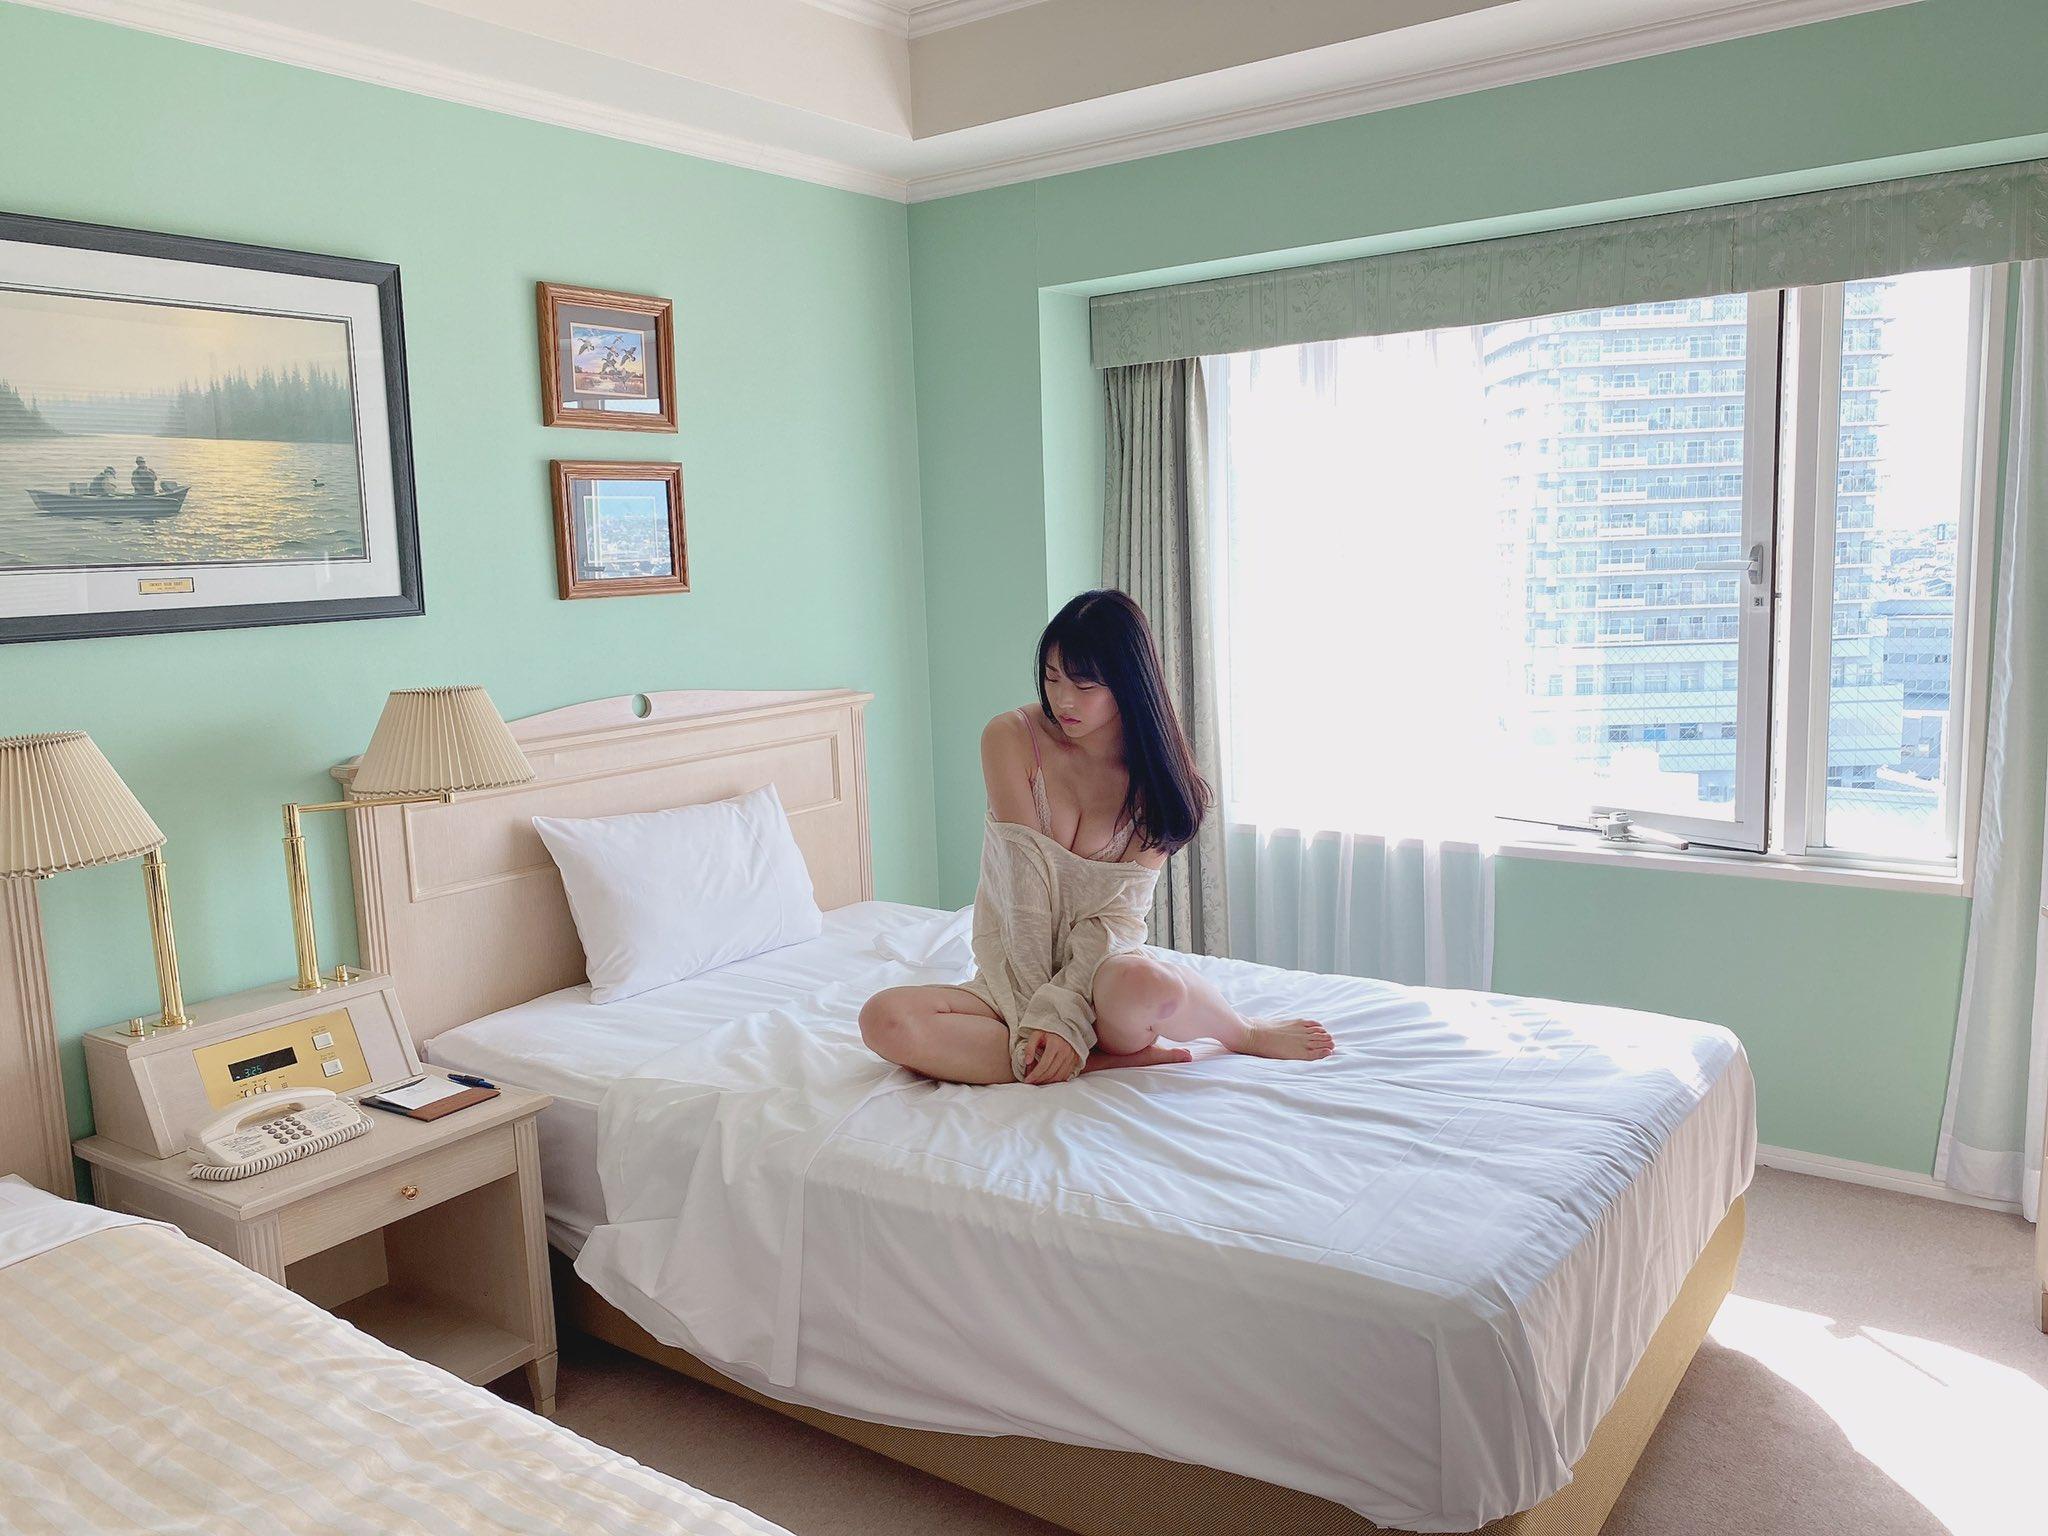 NMB48白間美瑠「女神のような美スタイル…」雑誌グラビアの撮影オフショットにファン歓喜【画像4枚】の画像003